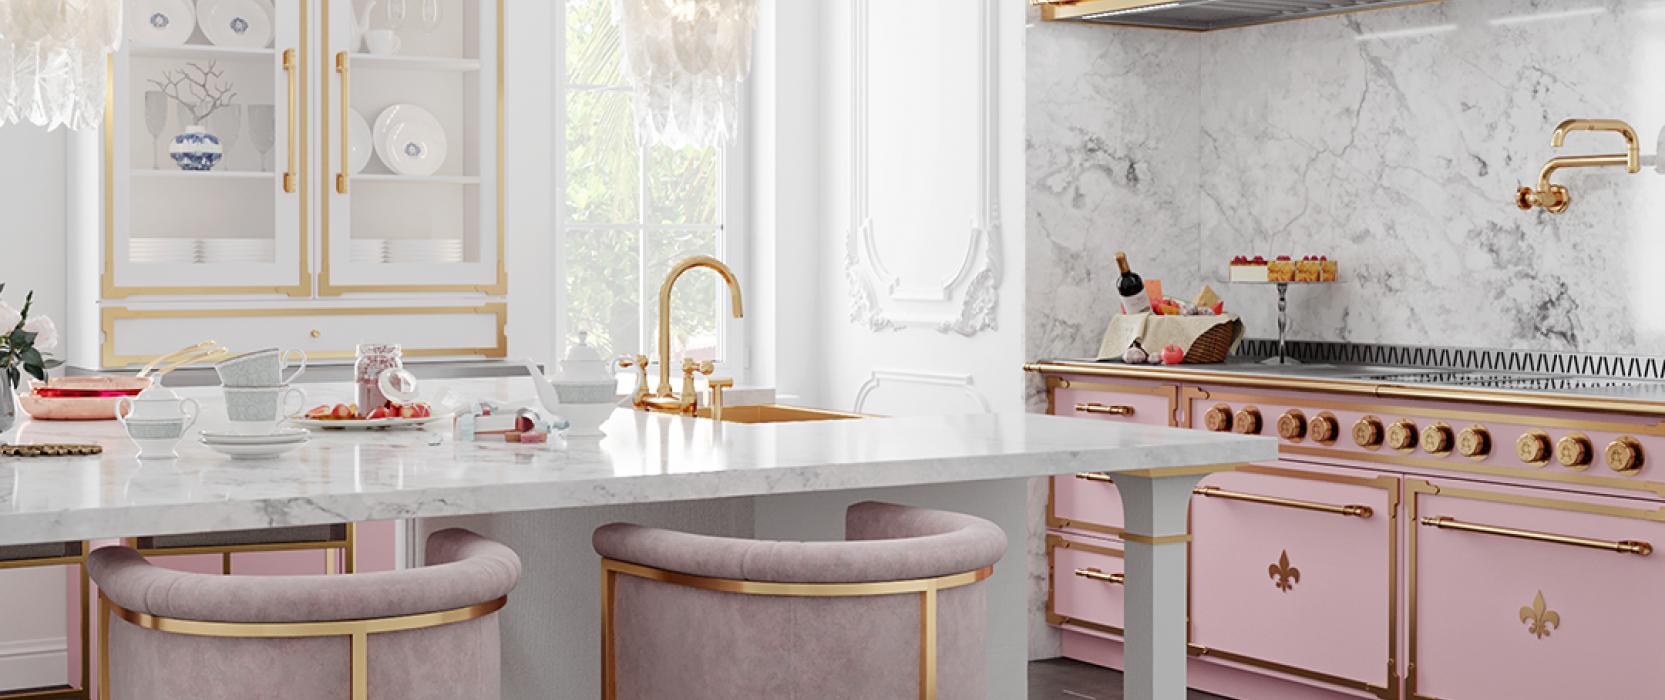 Pink L'atelier stove in bright white kitchen